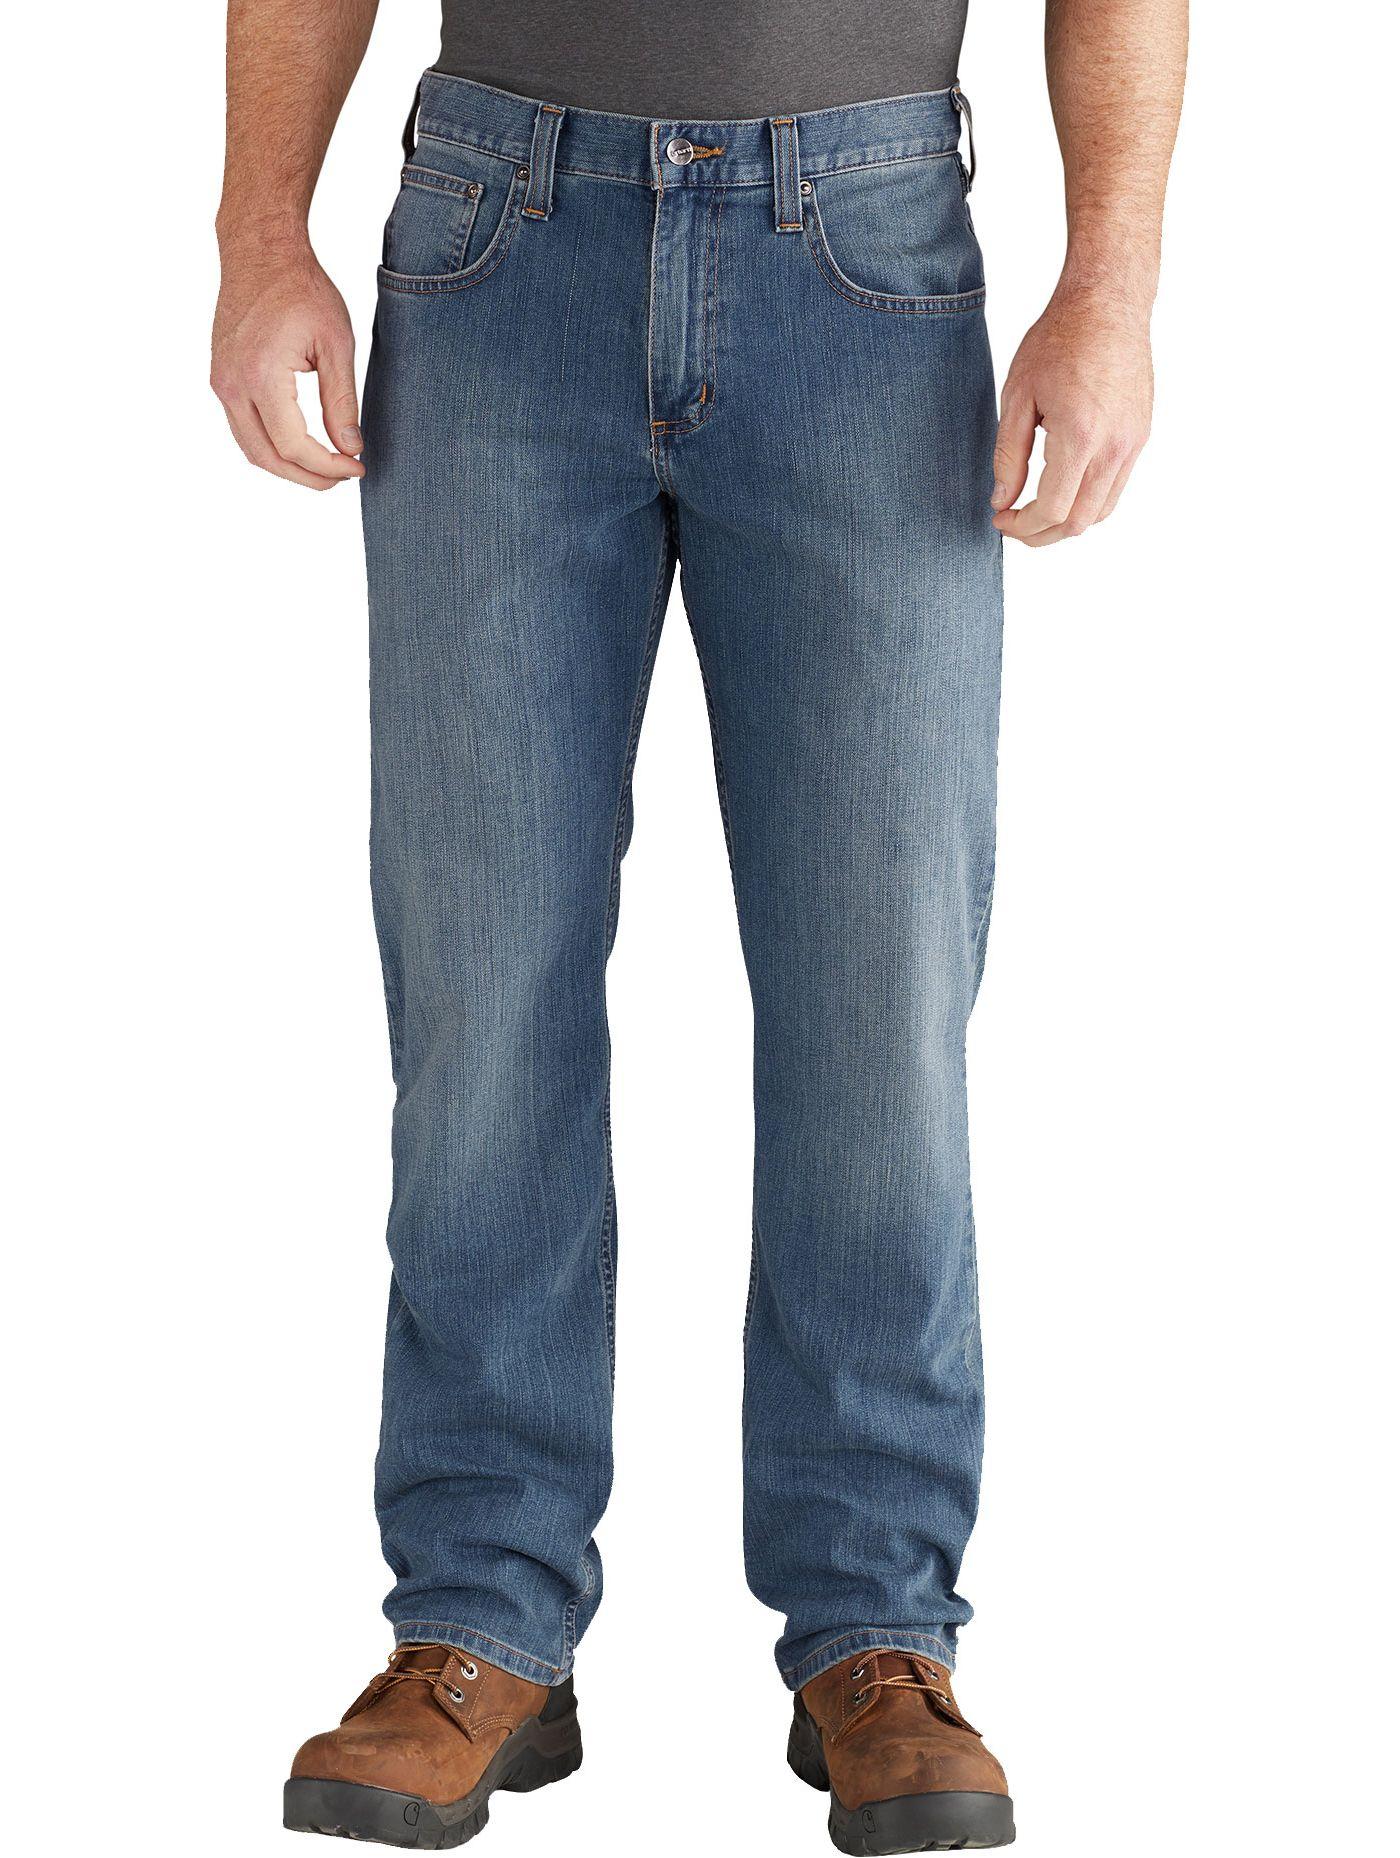 Carhartt Men's Rugged Flex Relaxed Straight Leg Jeans